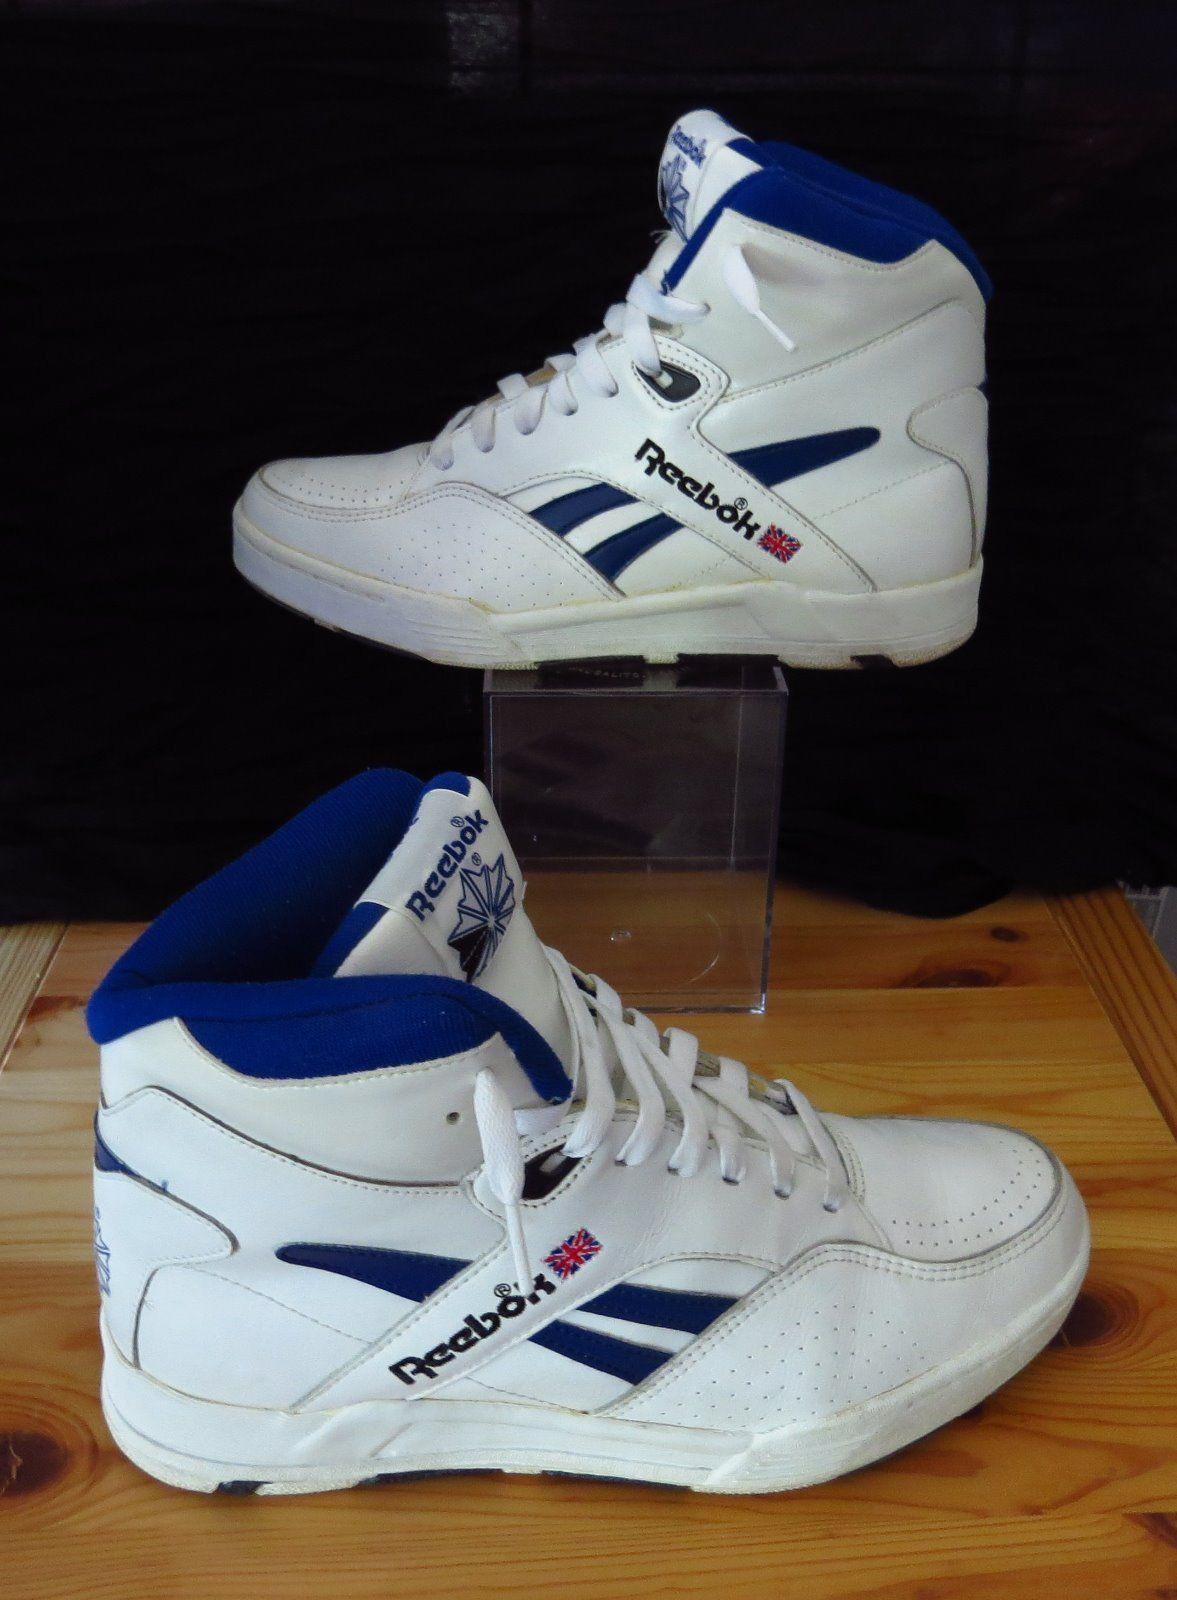 d3cf36f09c07b Vintage Reebok BB 4600 Ultra Hi 4 6336 White Royal Blue Black Men s US Size  7